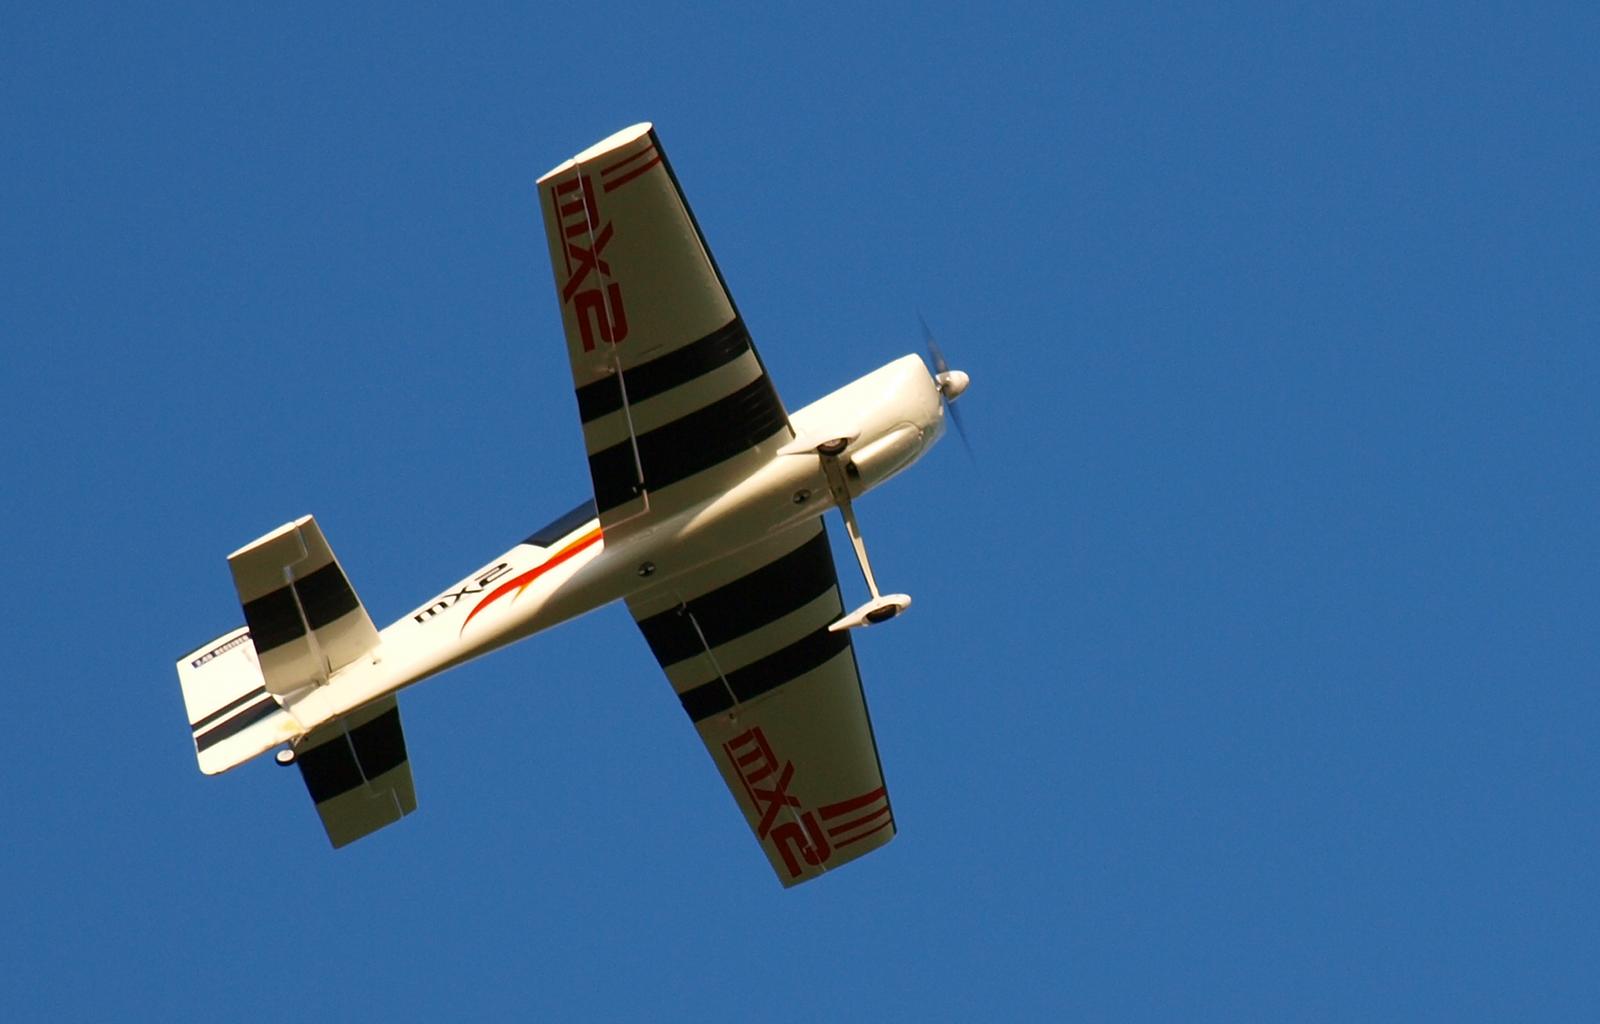 Radio-controlled aircraft | Military Wiki | FANDOM powered